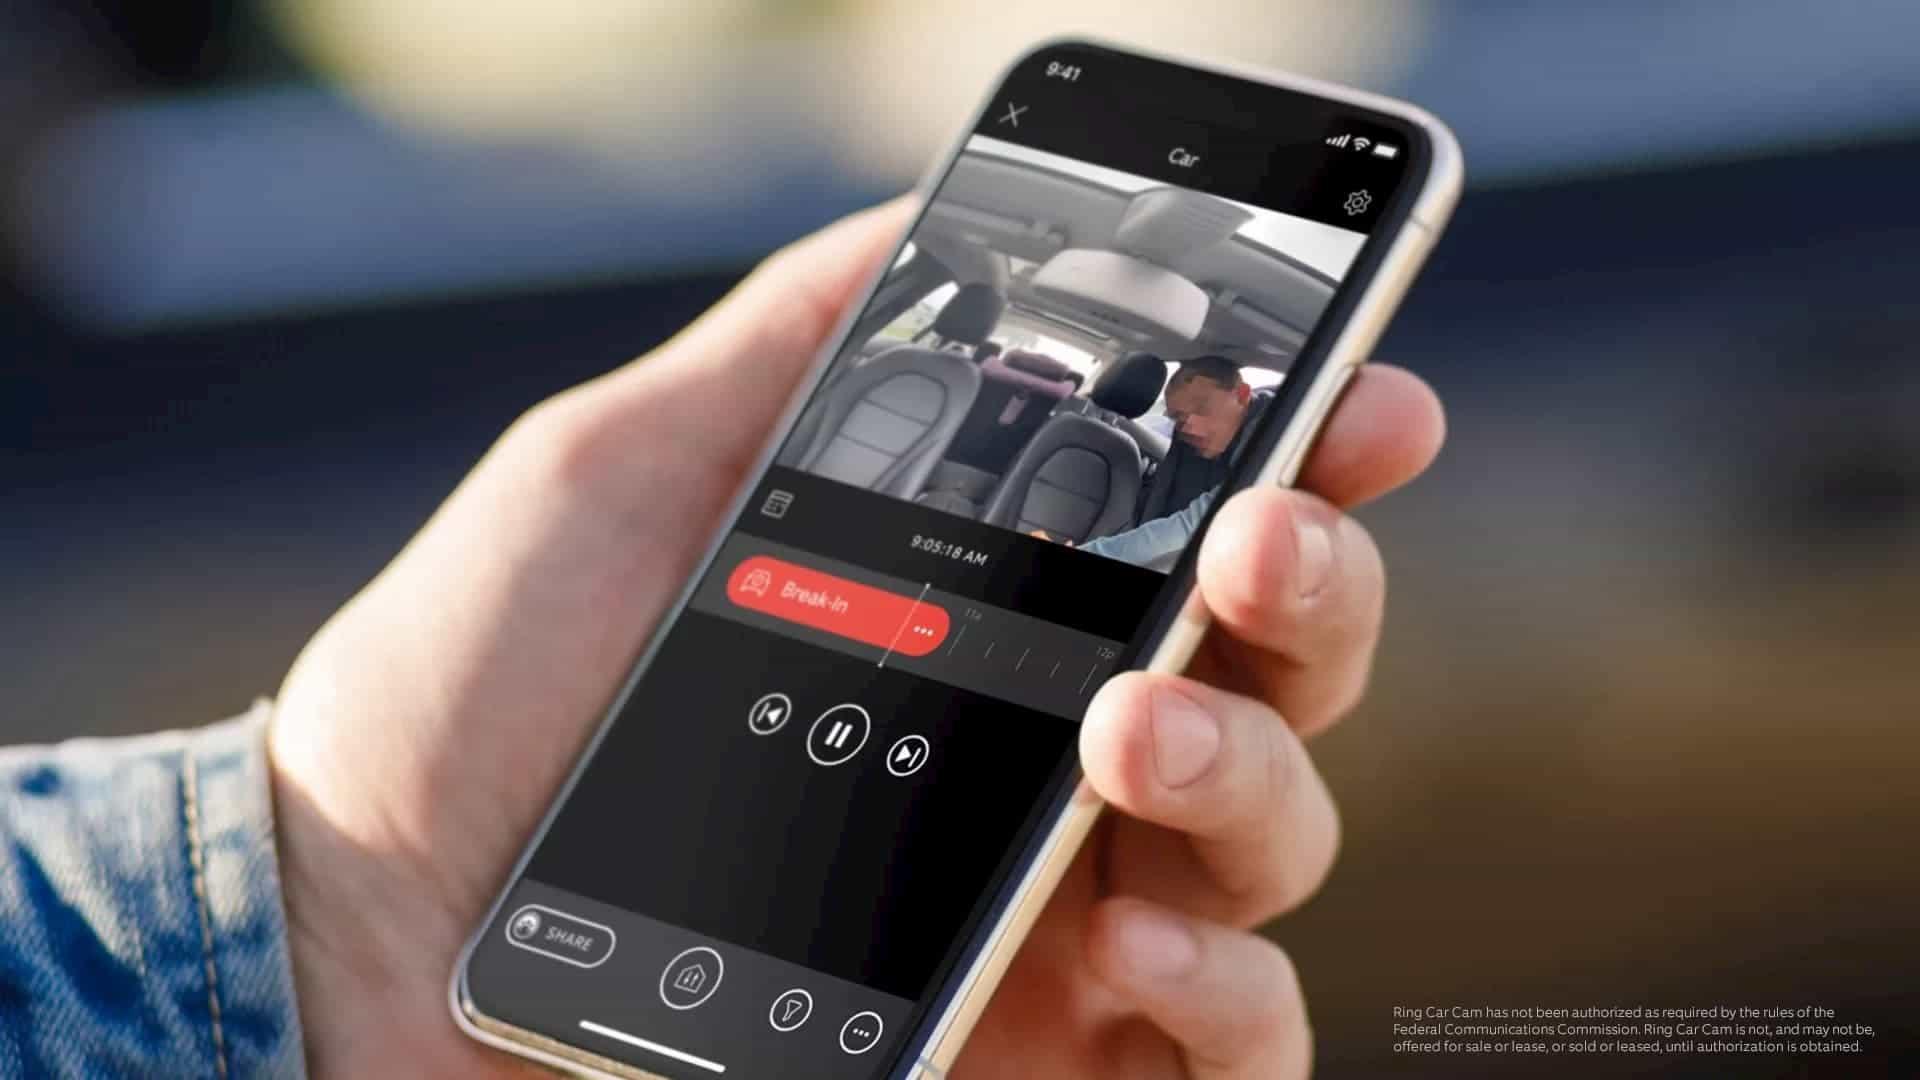 20200921 image blog car cam desktop 2x fcc rgb